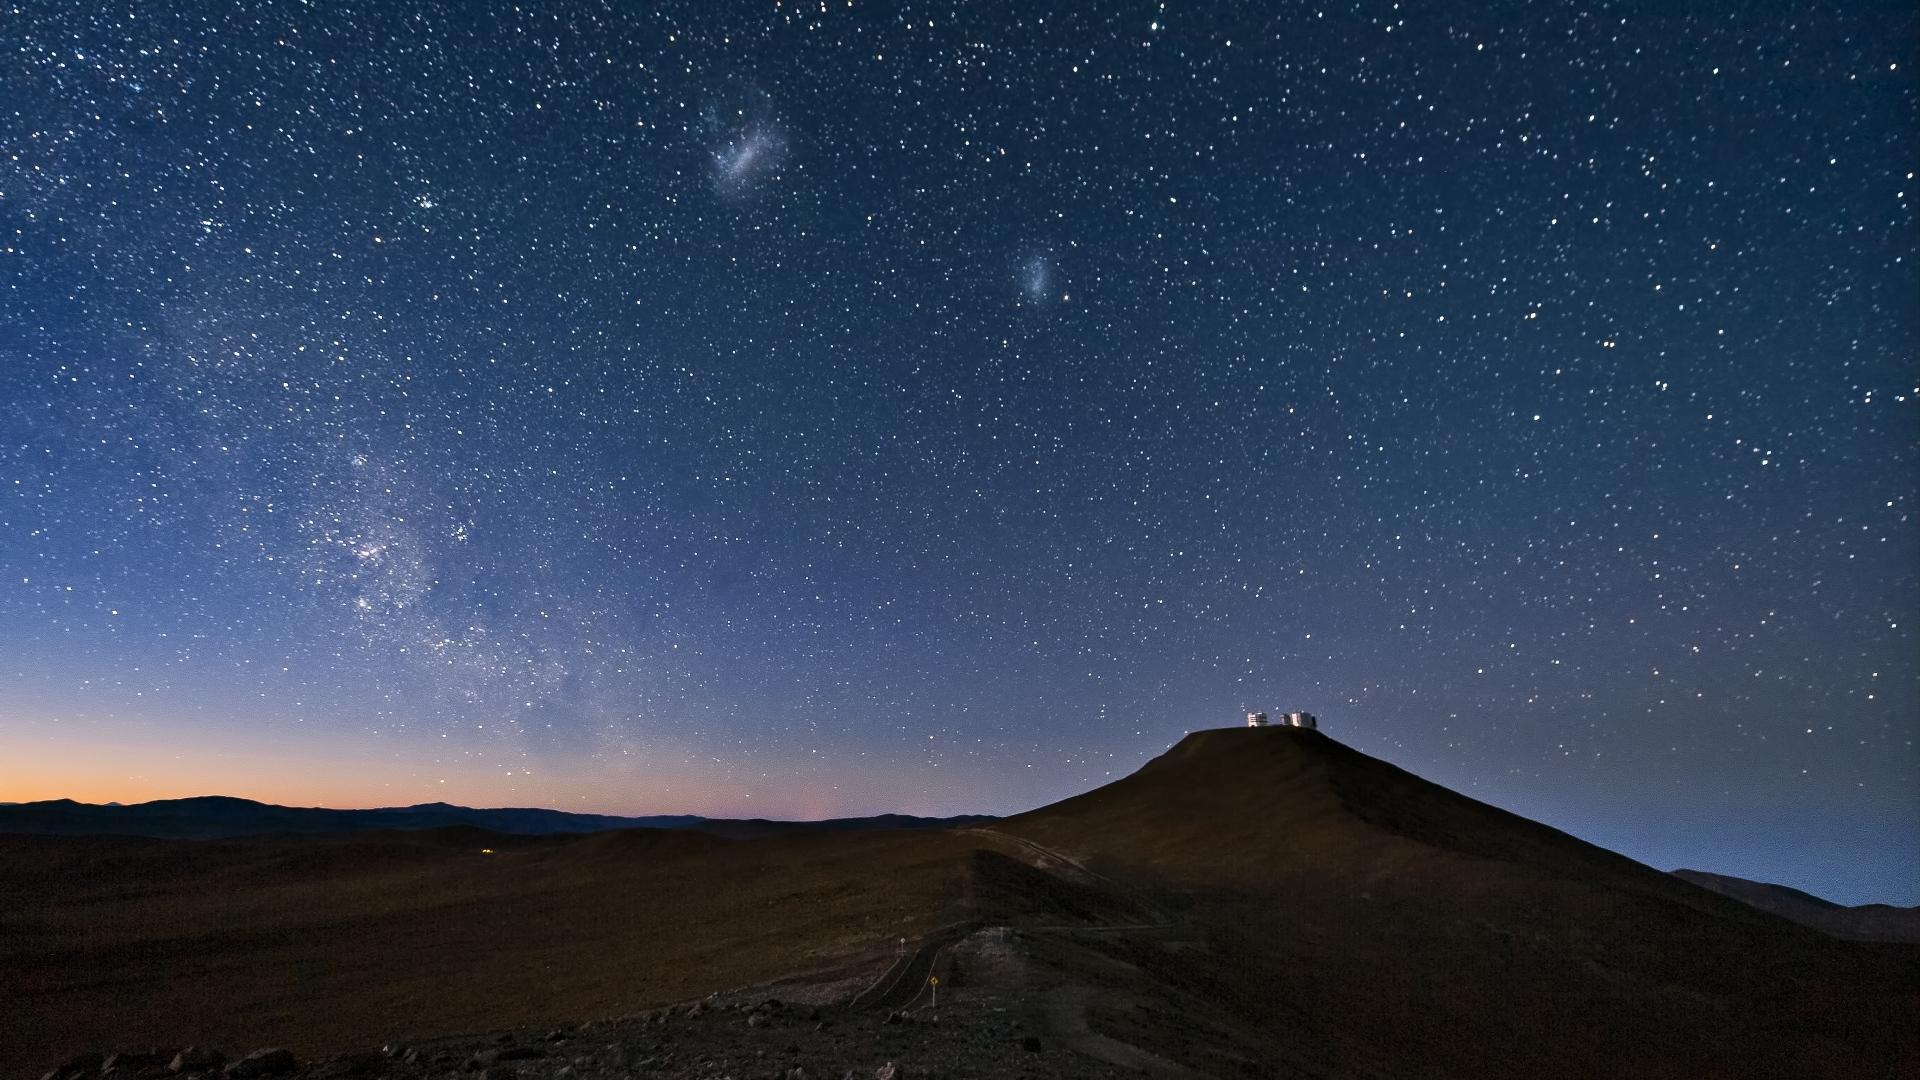 Download Wallpaper 1920x1080 Sky Constellations Night